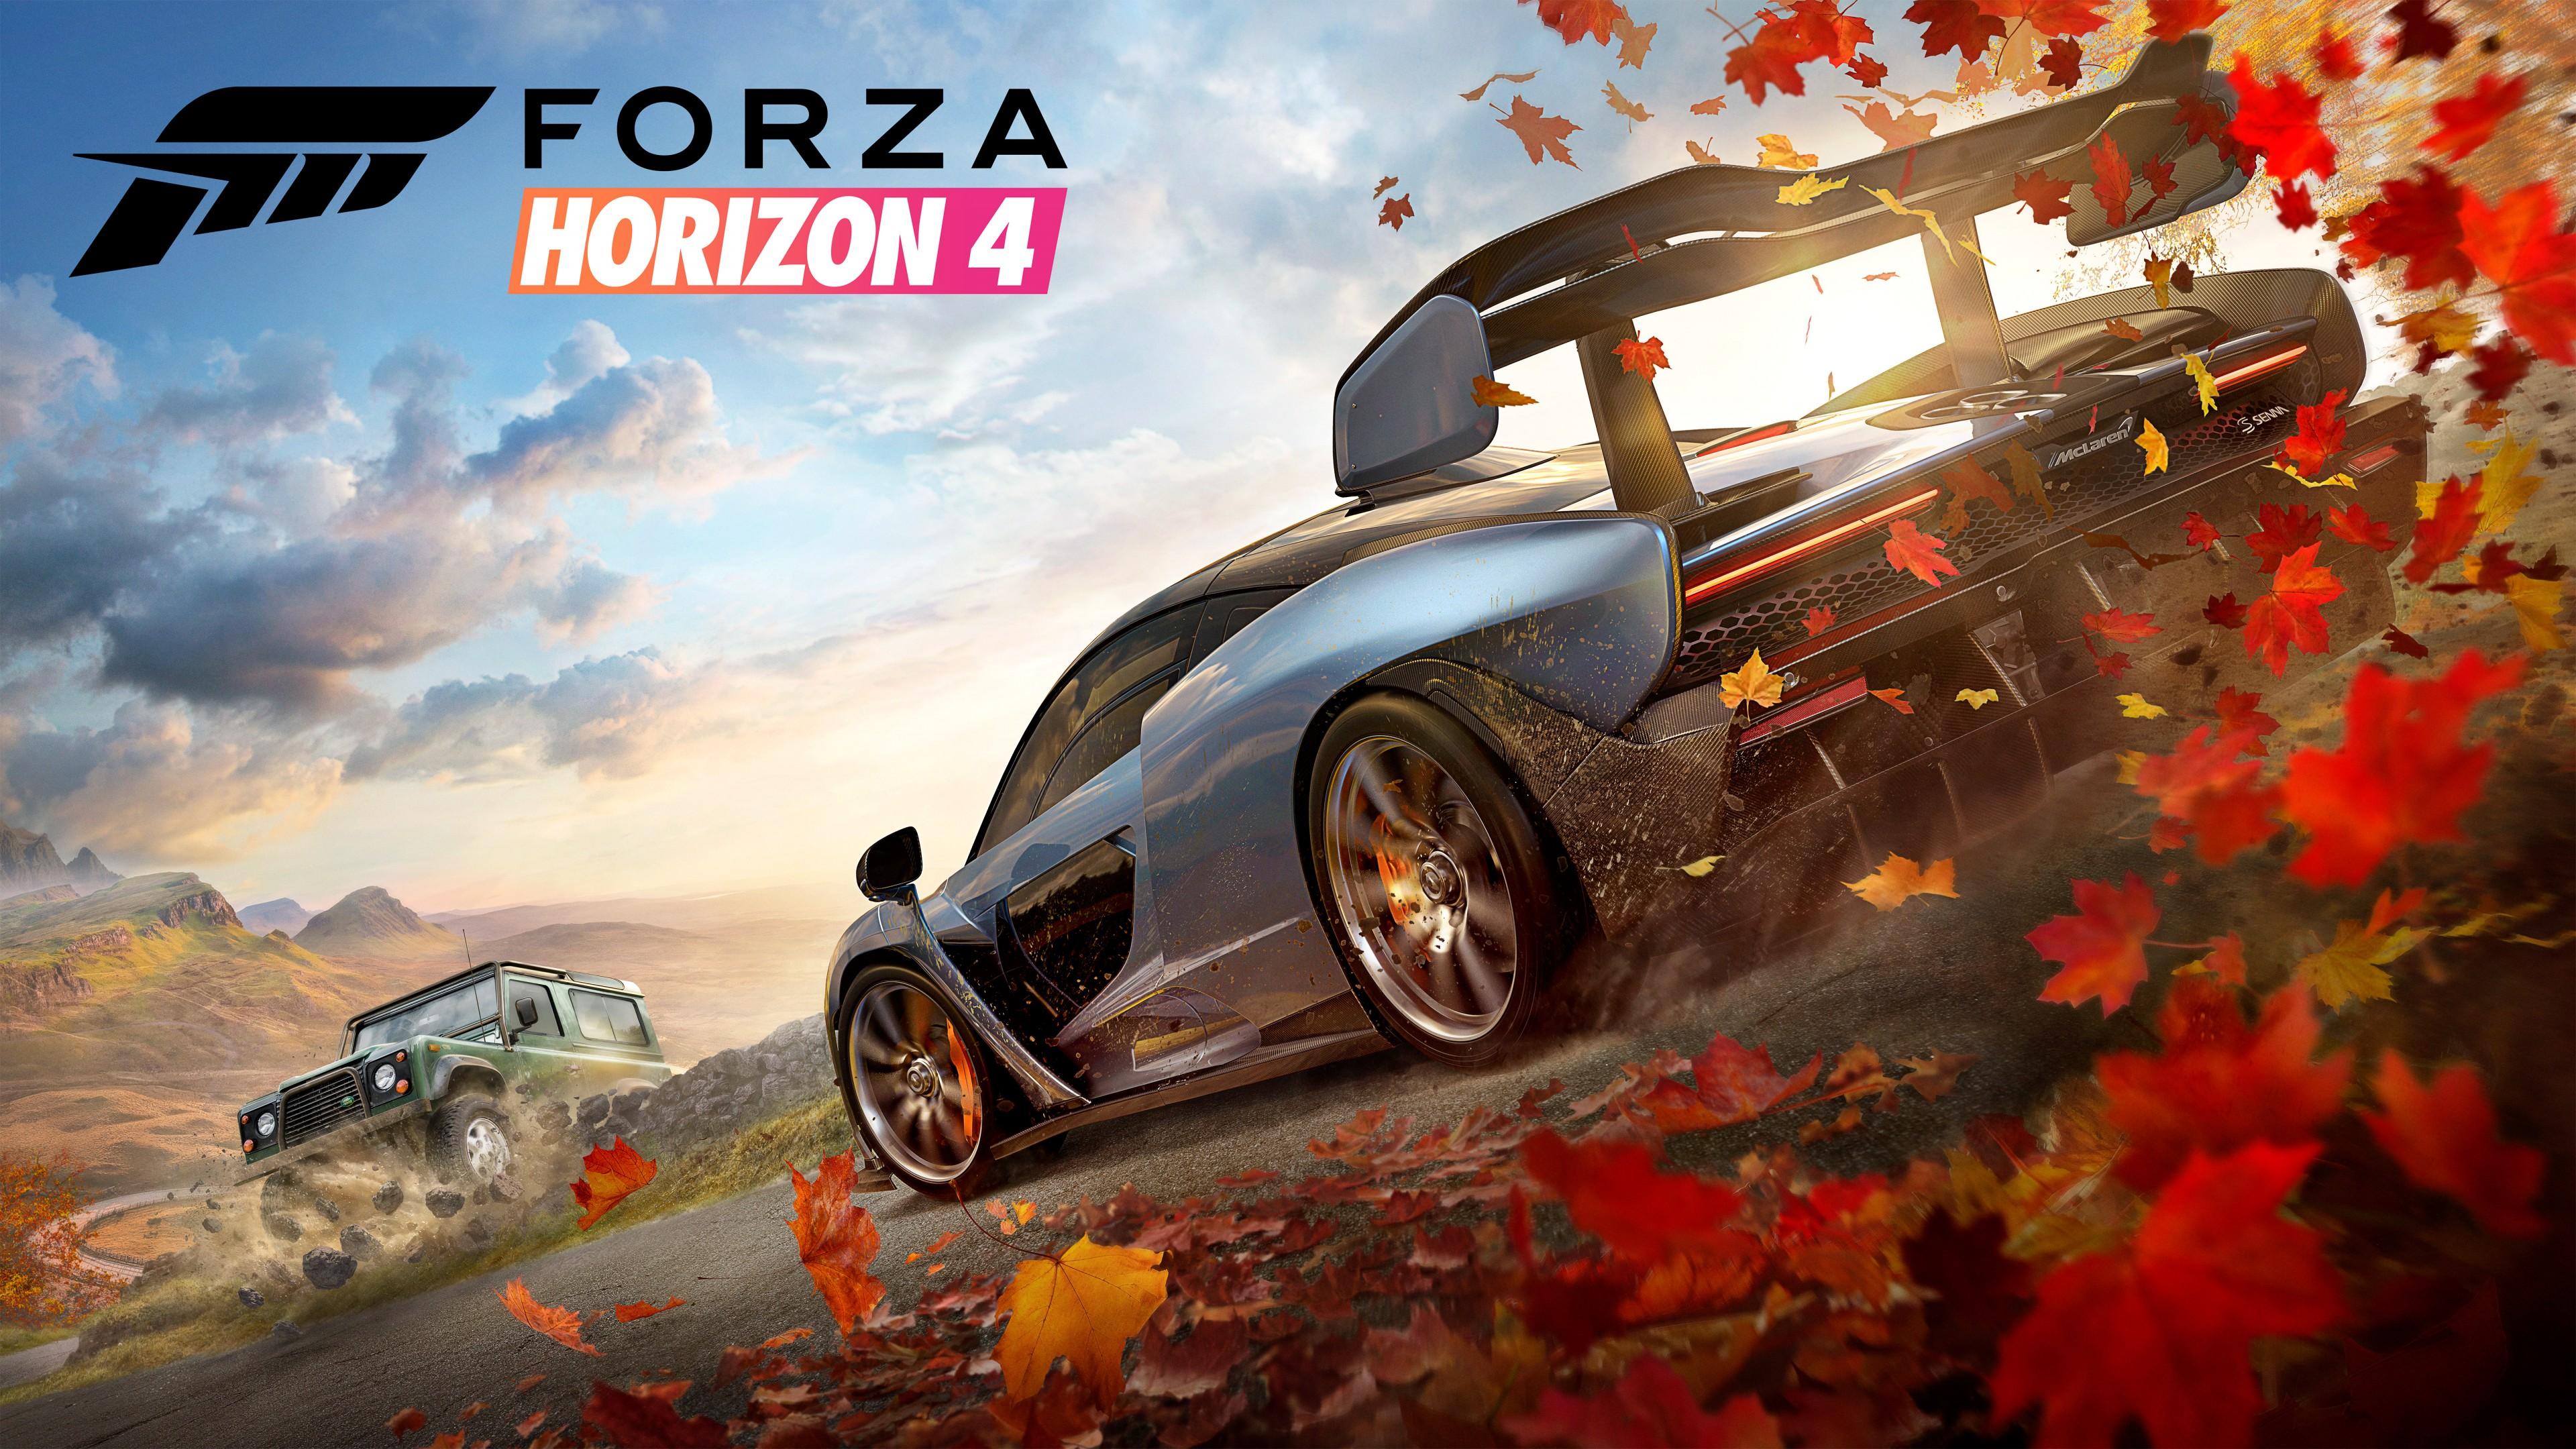 Bmw M Wallpaper Iphone X Mclaren Senna In Forza Horizon 4 5k Wallpaper Hd Car